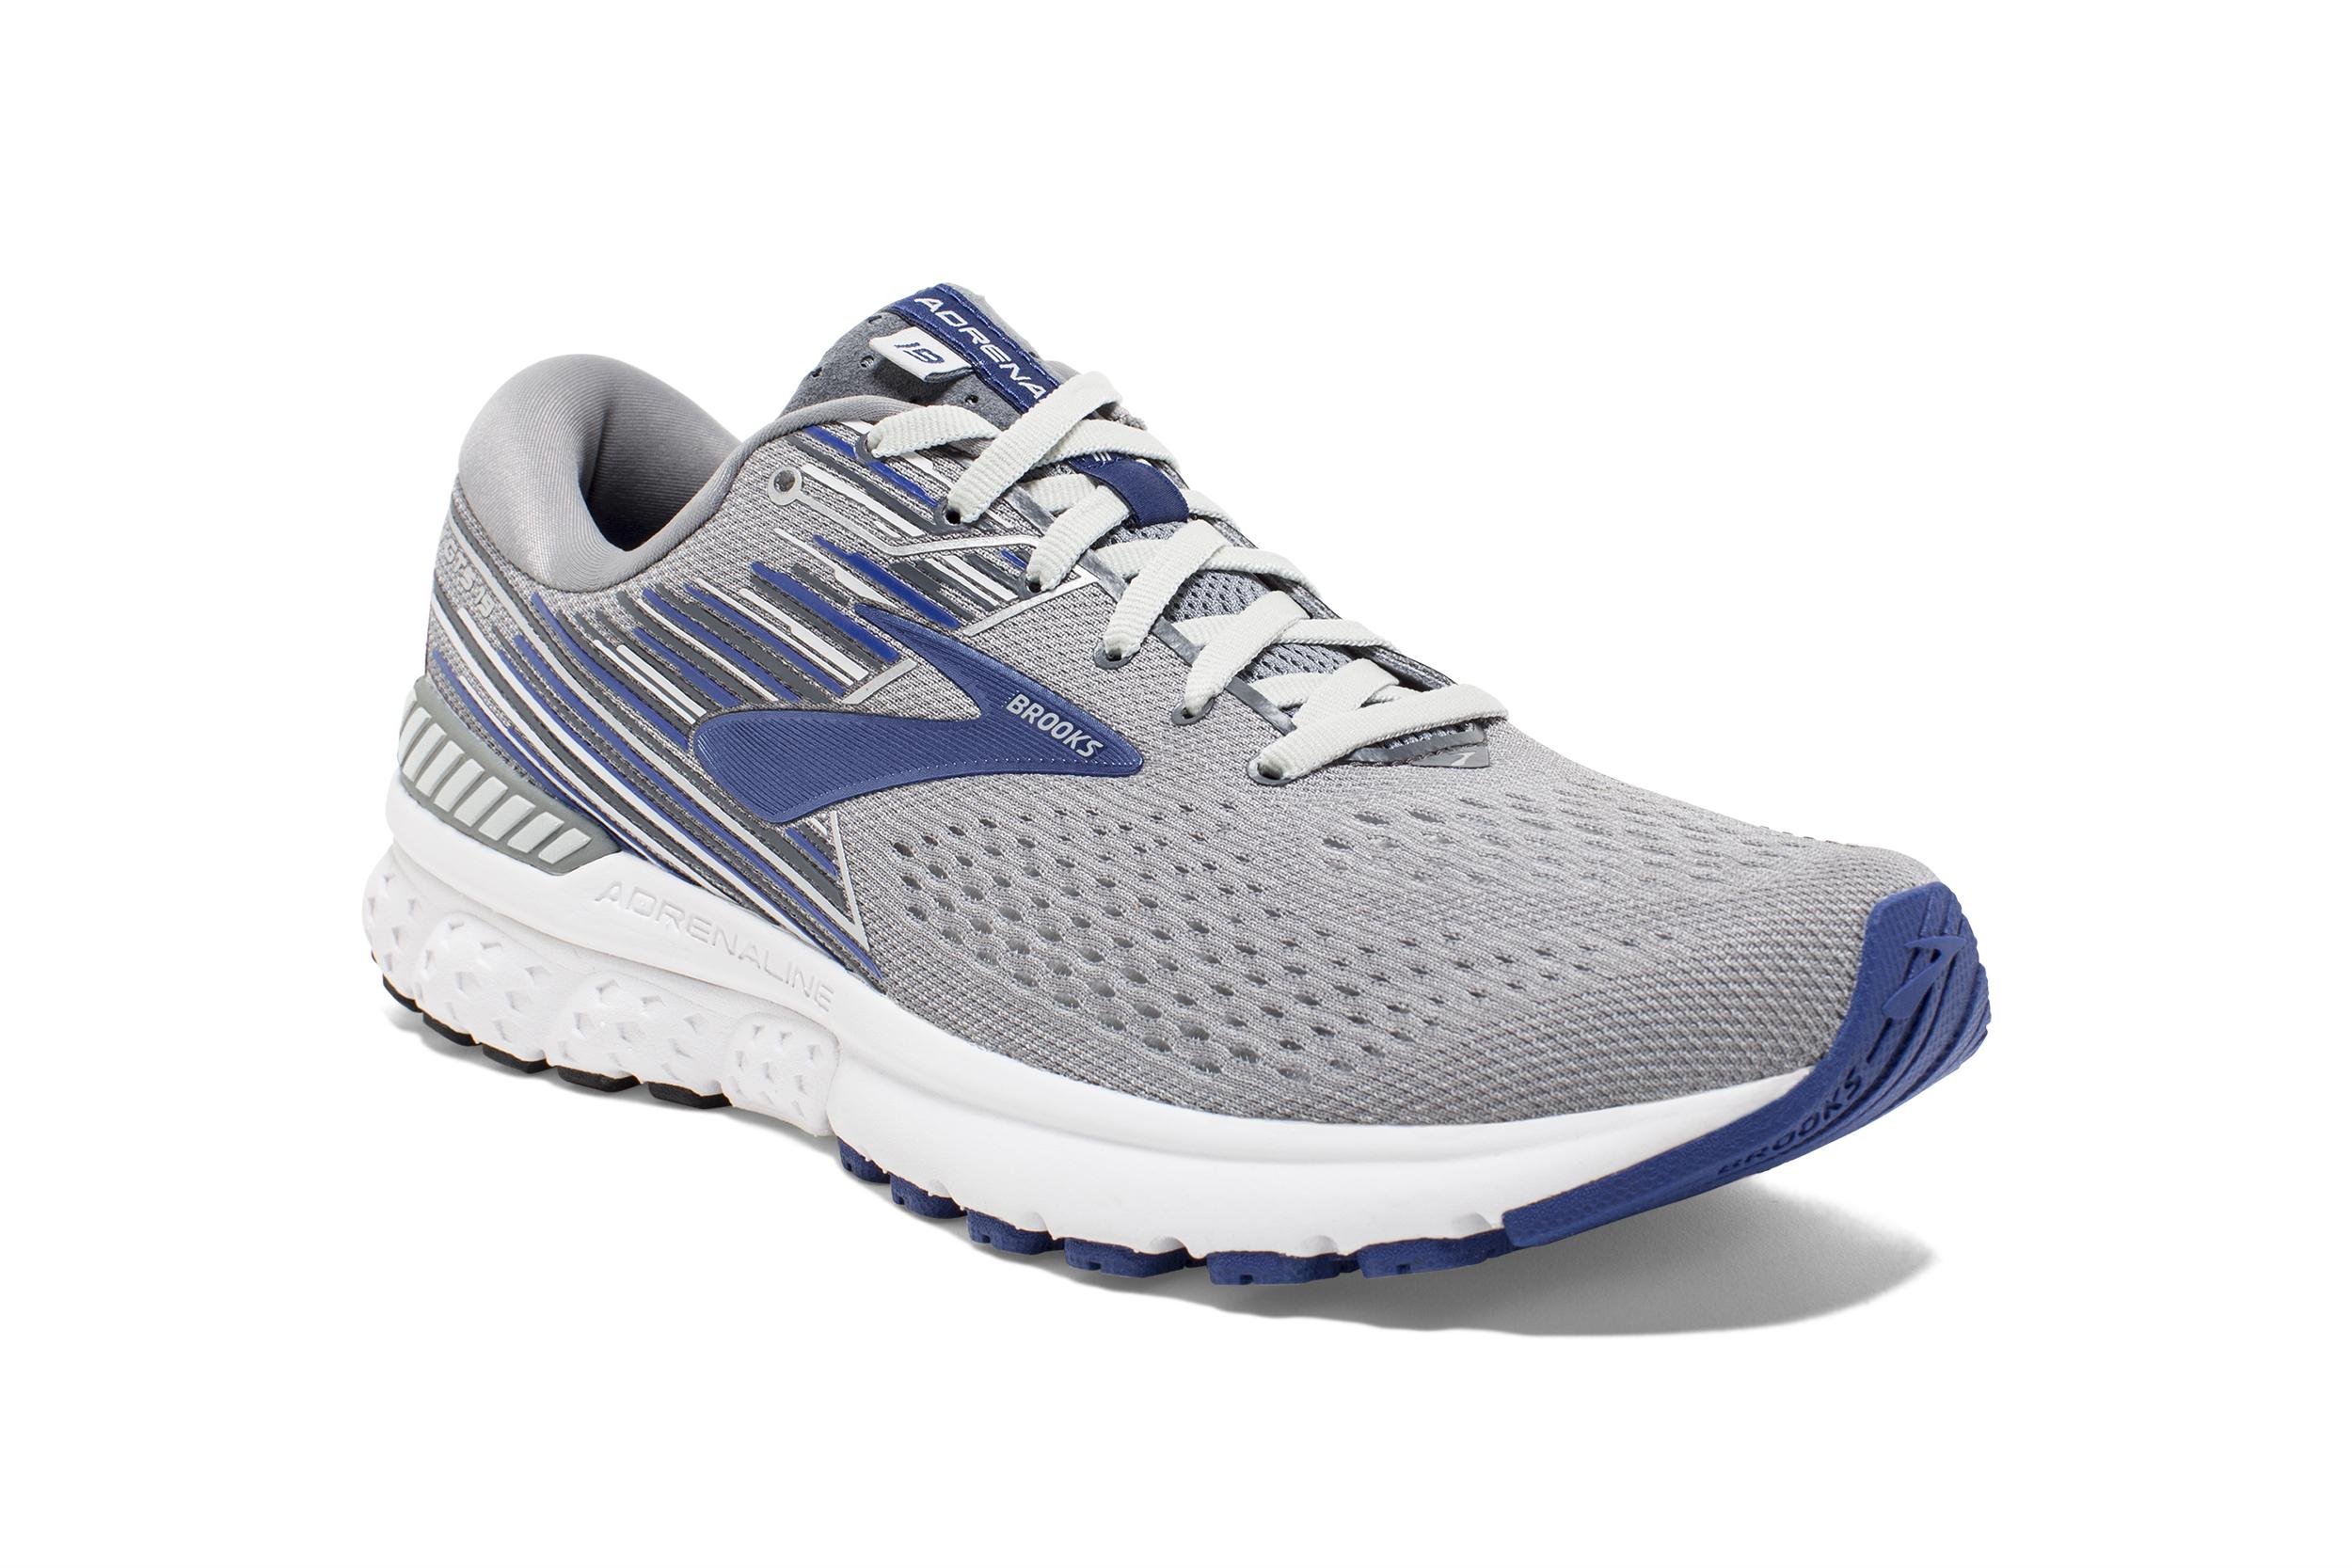 398360e44f5 Brooks Adrenaline GTS19 Road Running Shoes - Men s